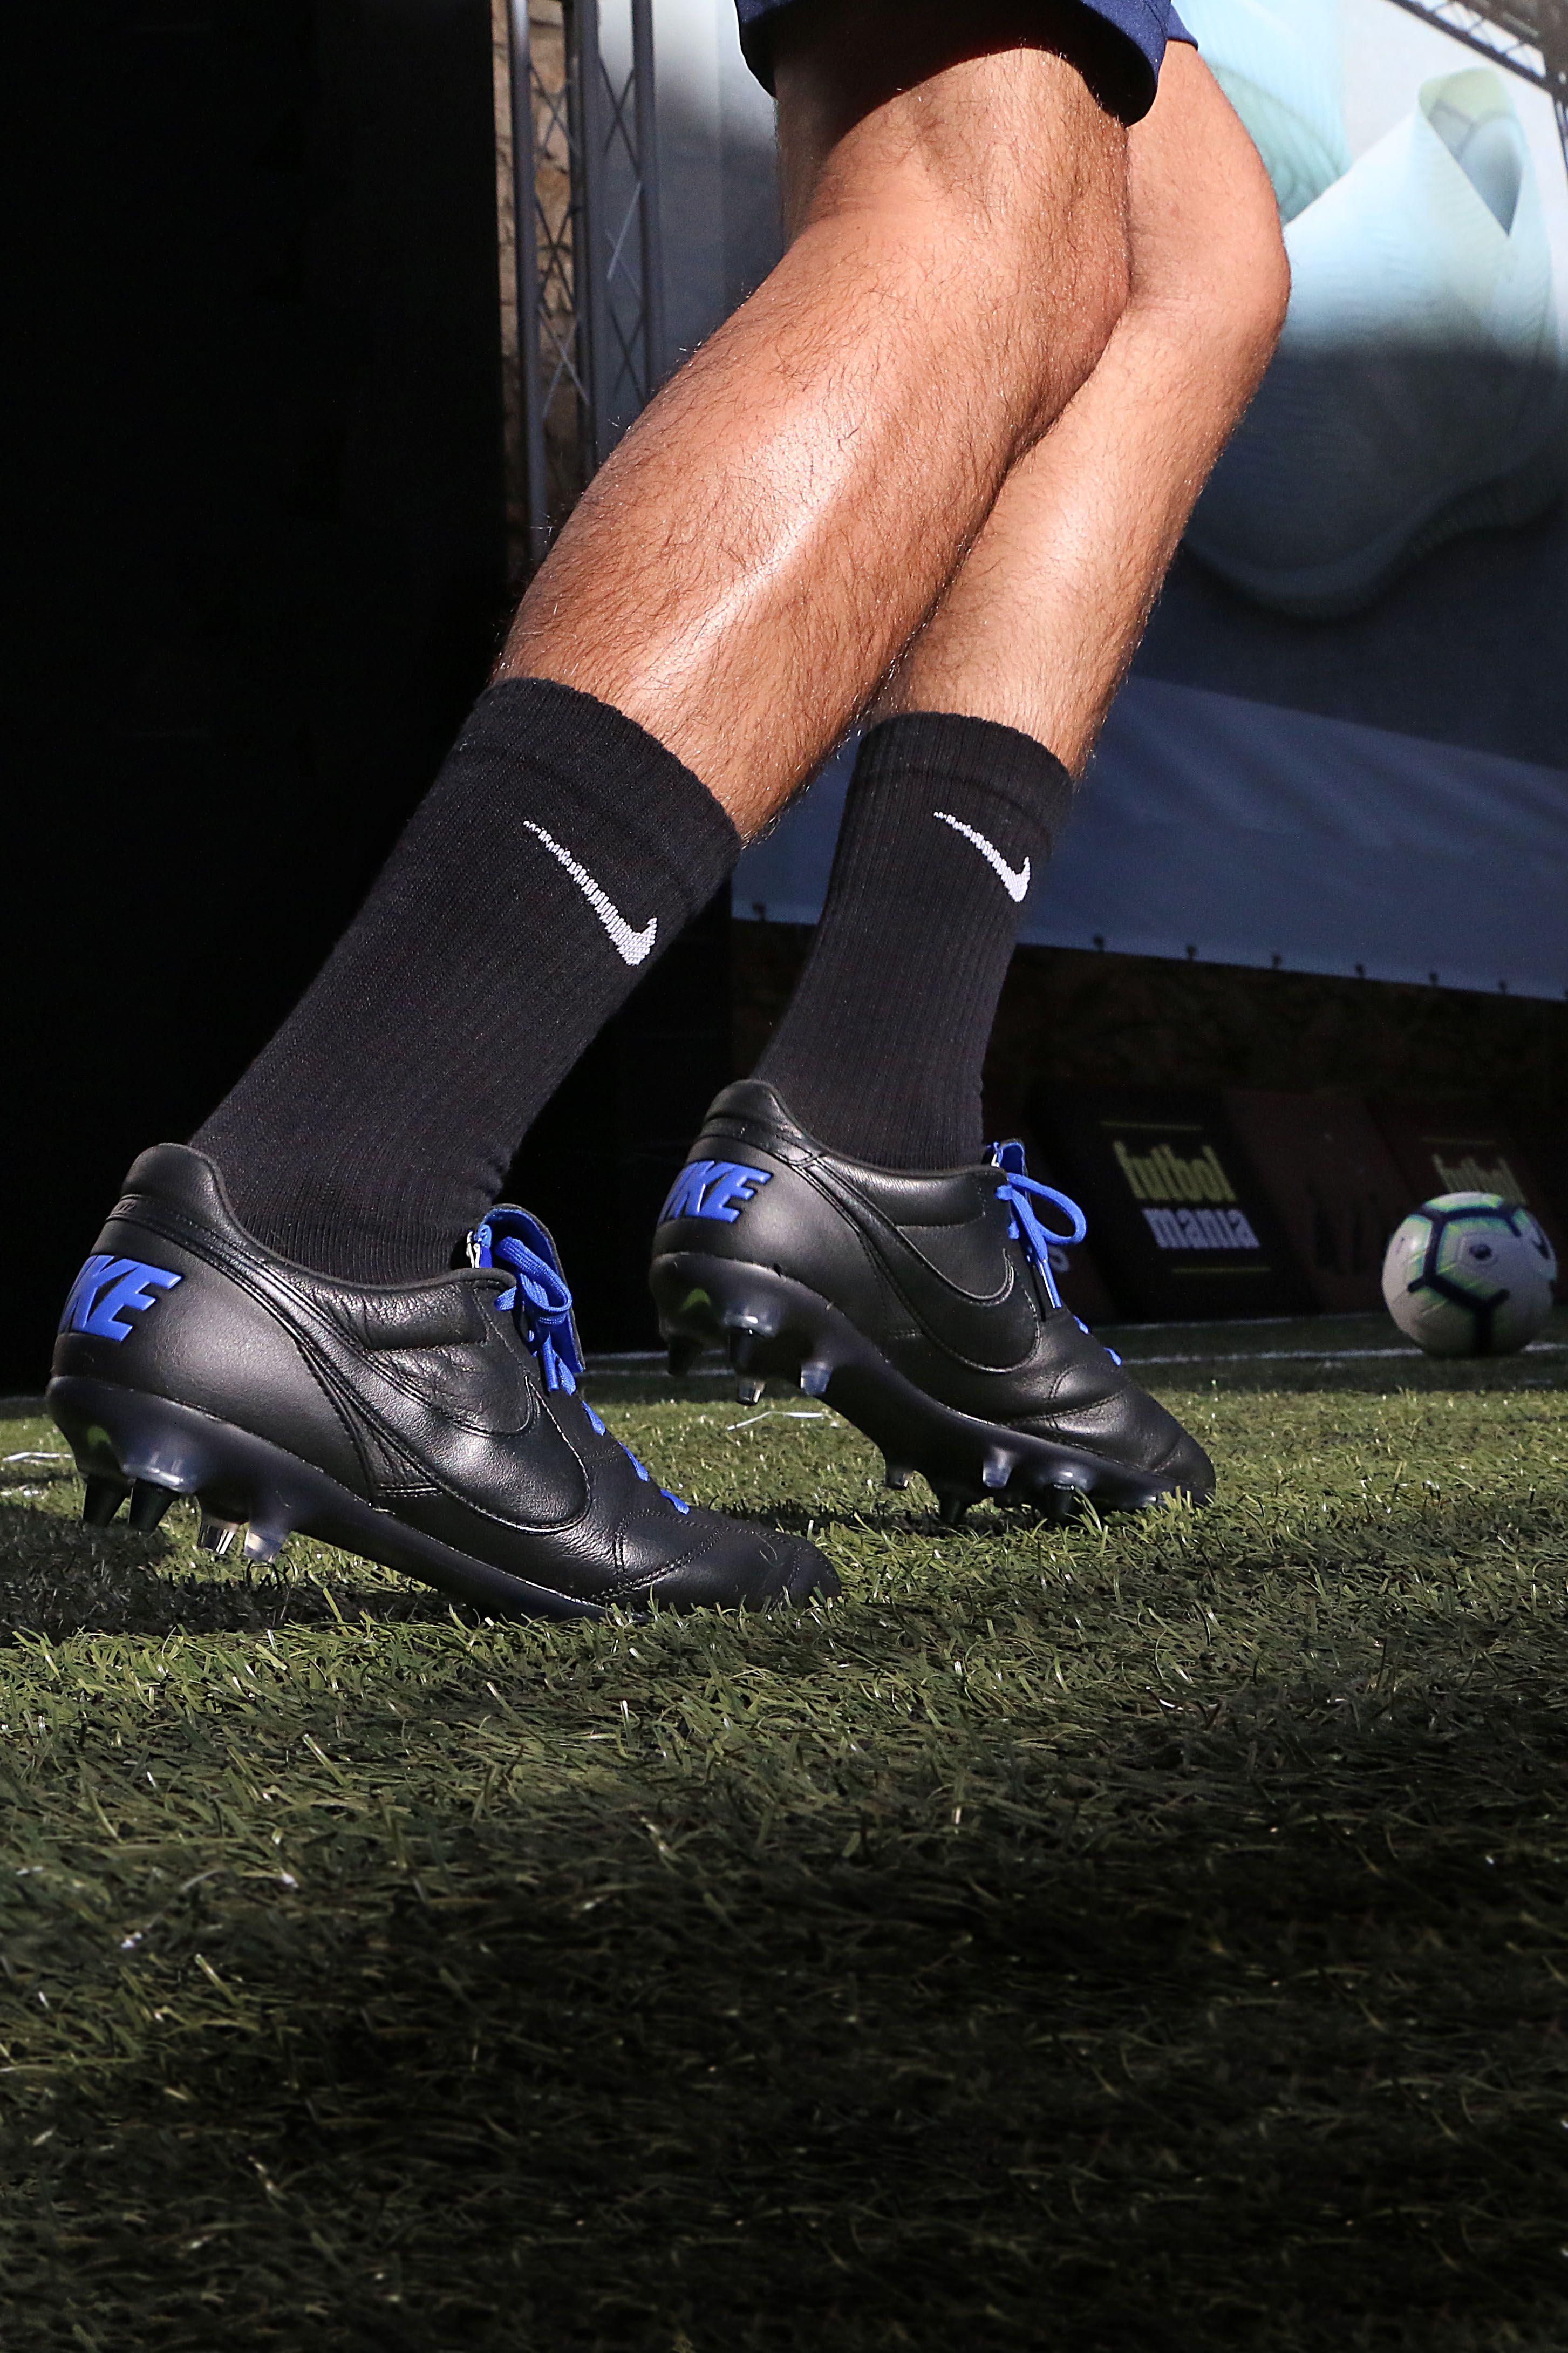 huge discount 90e36 fa647 Botas de fútbol de piel de canguro Nike SG-PRO para césped natural blando -  negras y azules